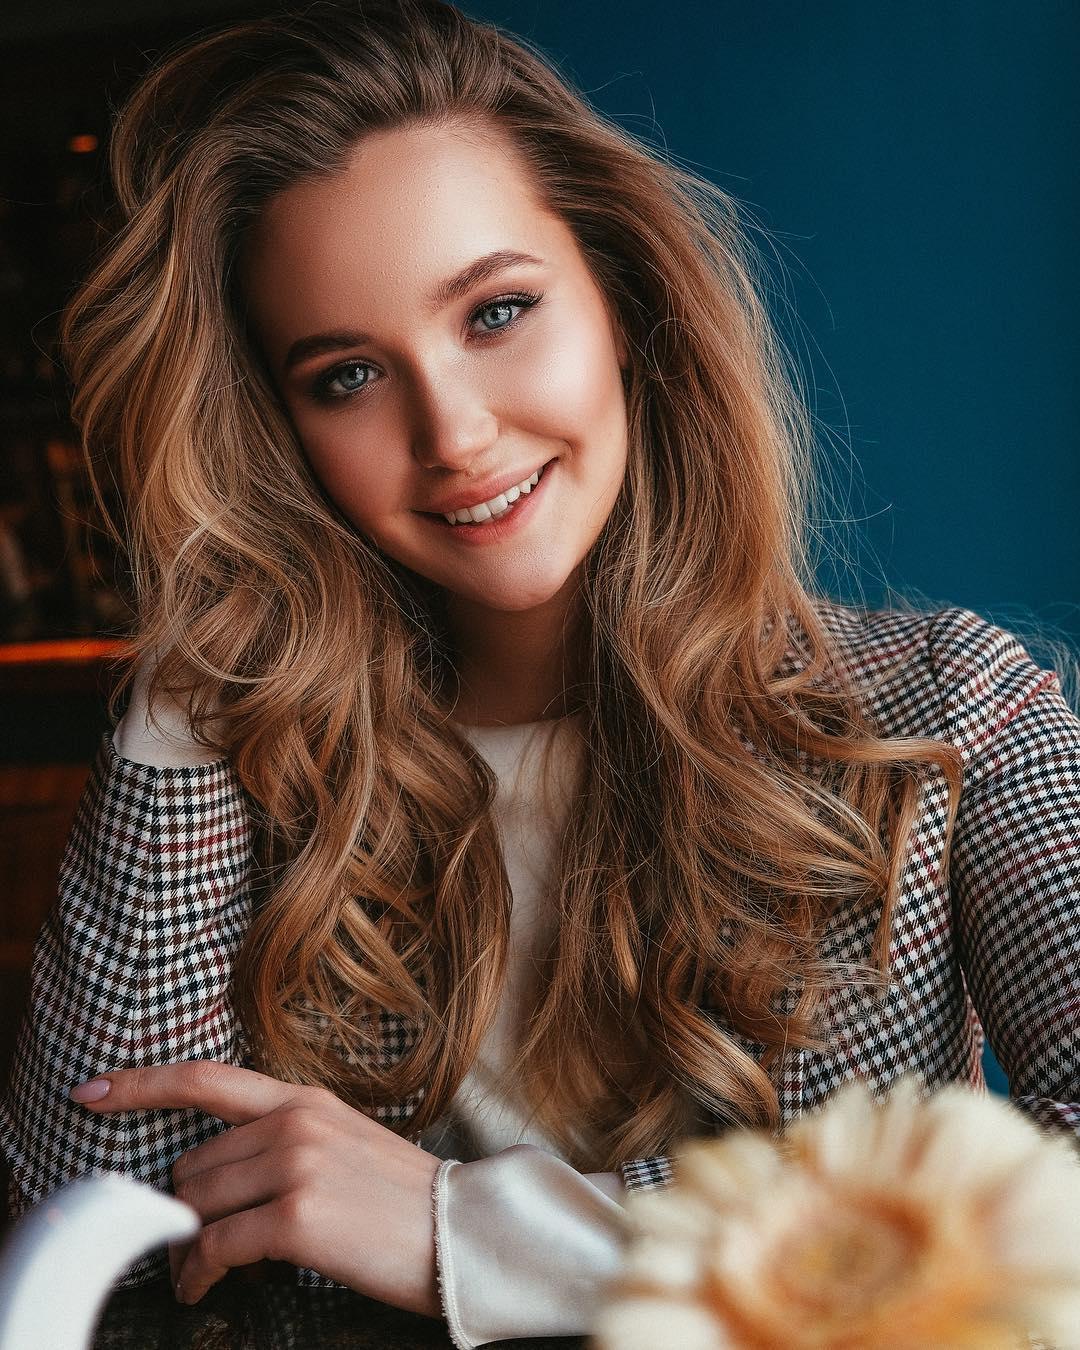 Bachelorette Russia - Plan B on TNT - Season 2 - Discussion - *Sleuthing Spoilers* - Page 2 Anihovskaya-17